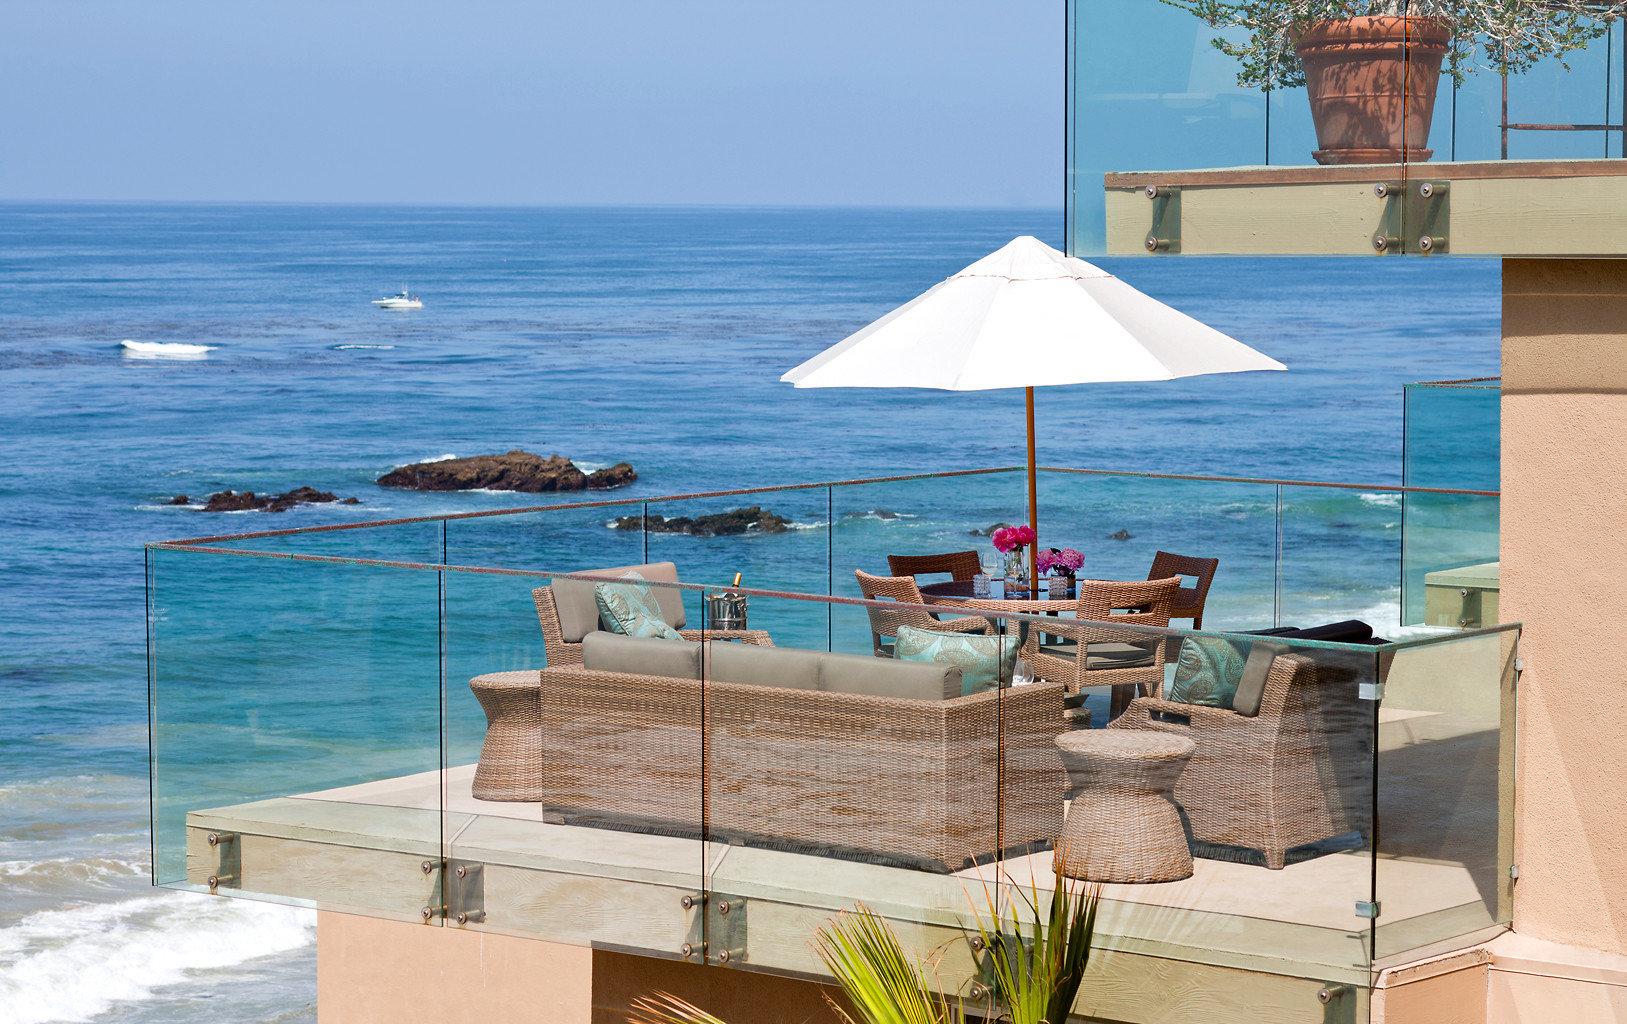 Balcony Beachfront Deck Elegant Lounge Modern Patio Terrace Waterfront water sky chair property Sea Ocean Resort swimming pool Beach caribbean Villa shore day